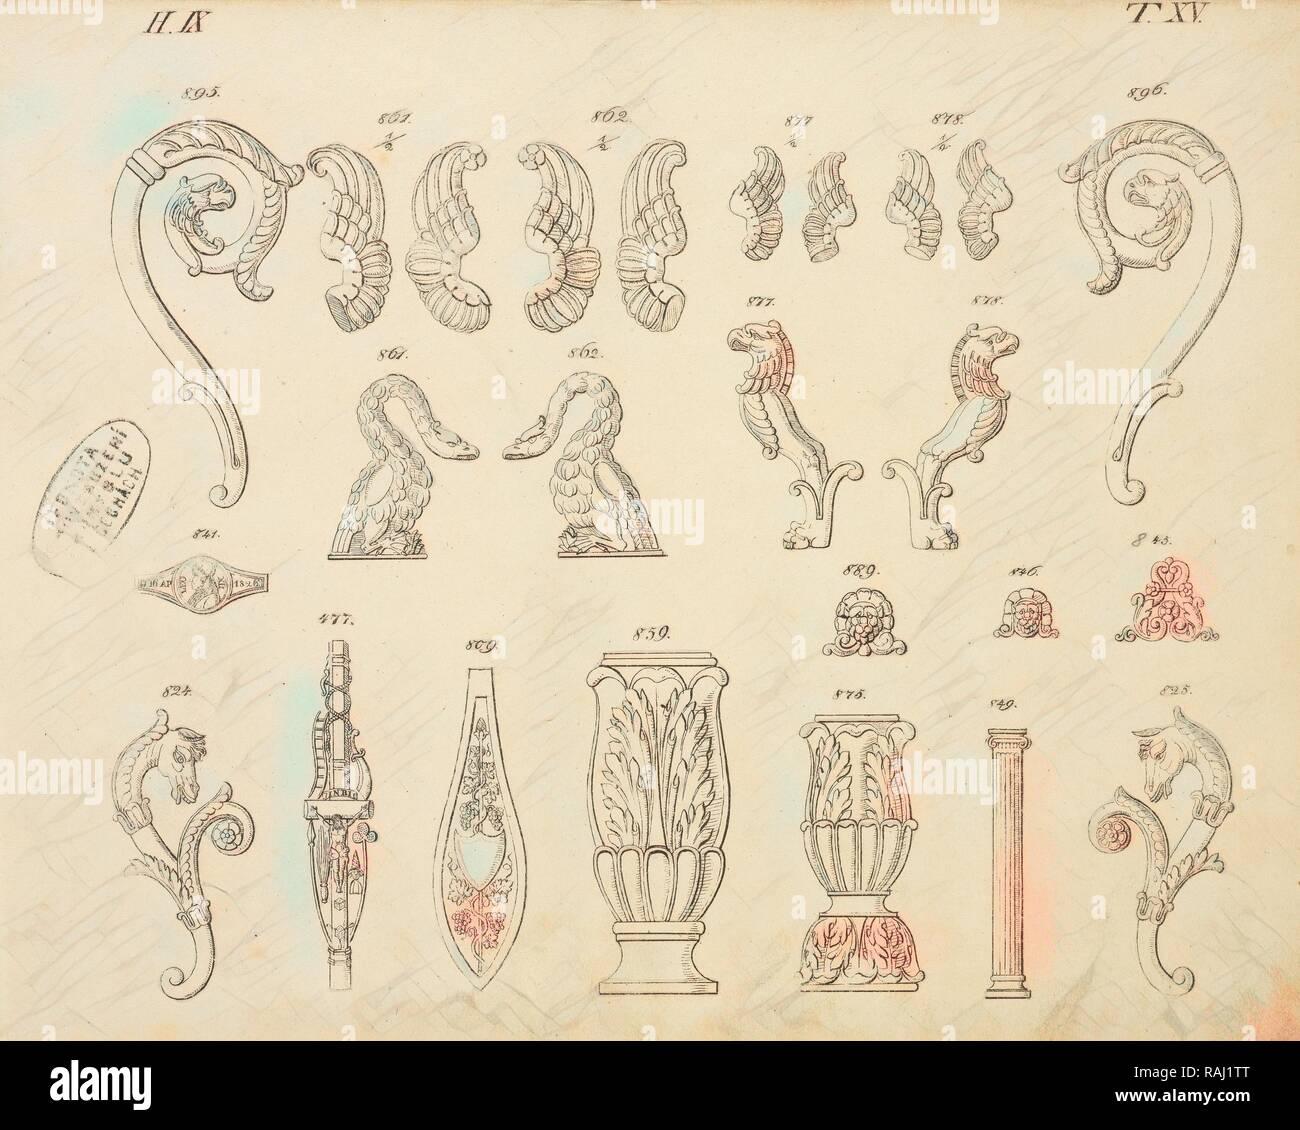 Animal and floral ornaments, Abbildungen von geprägten Ornamenten: Heft I-XII, Bruckmann, Peter, Engraving, between reimagined - Stock Image